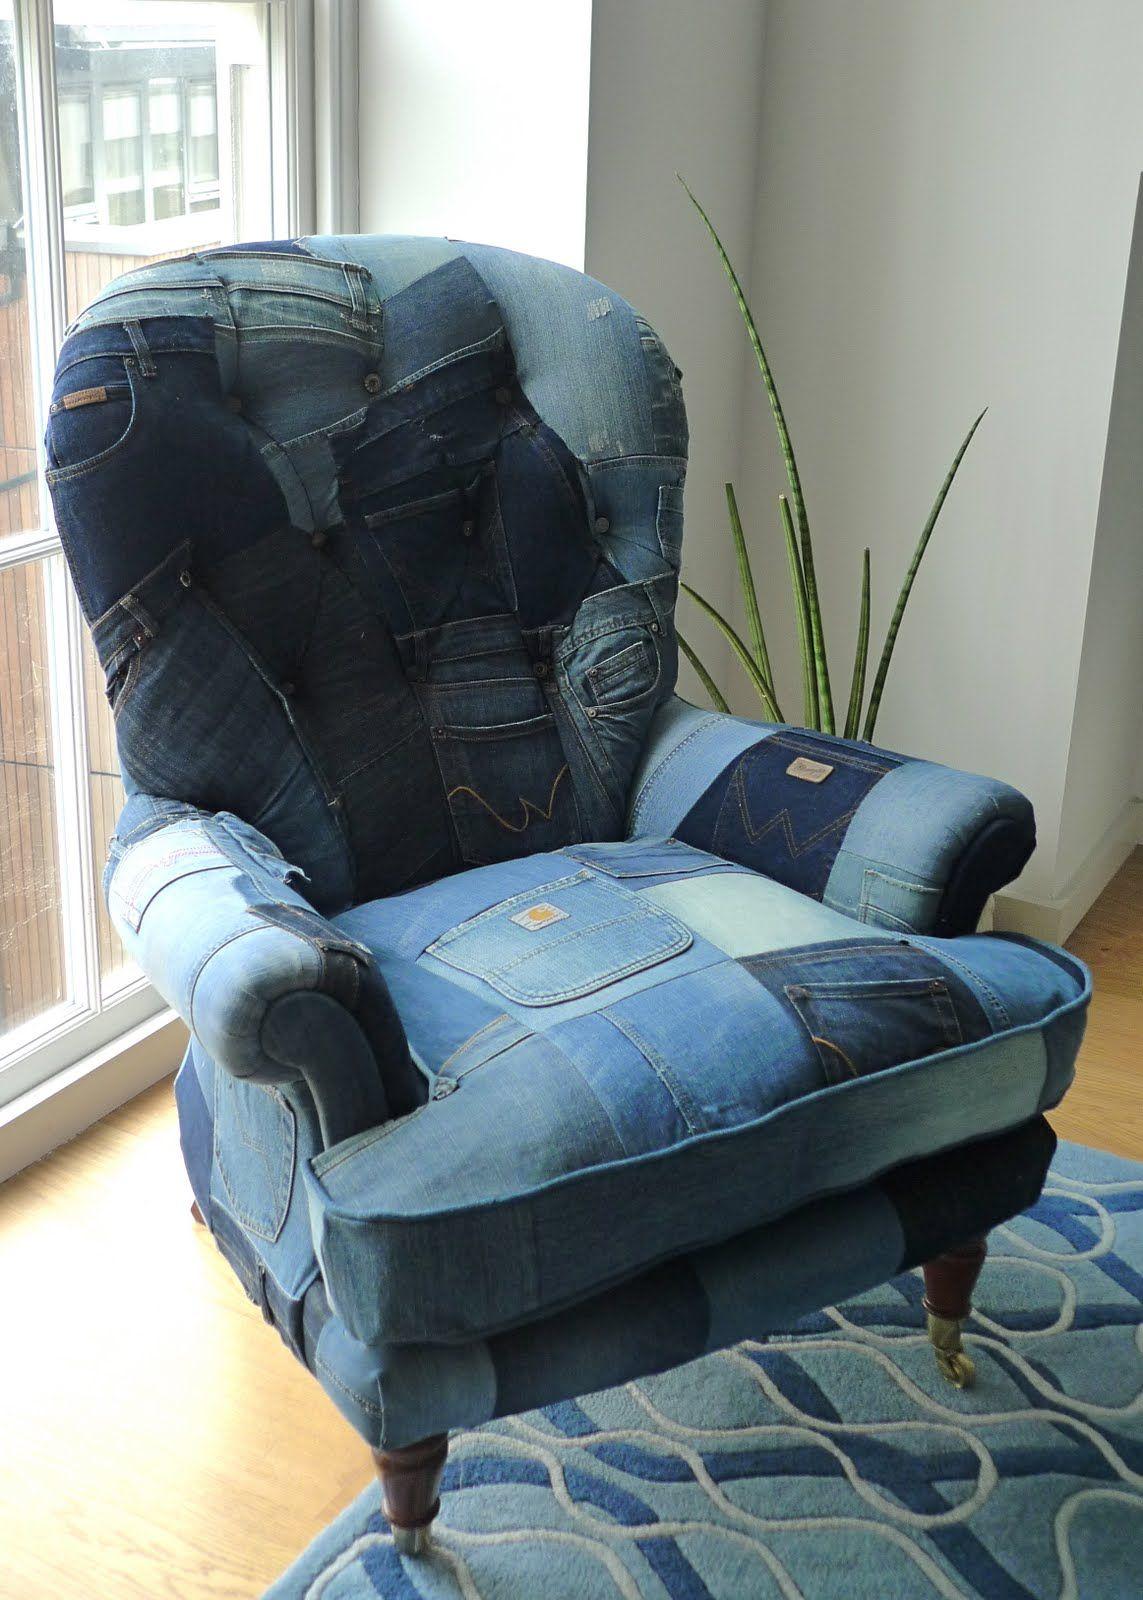 Denim Upholstered Armchair Recycled Denim Ideas